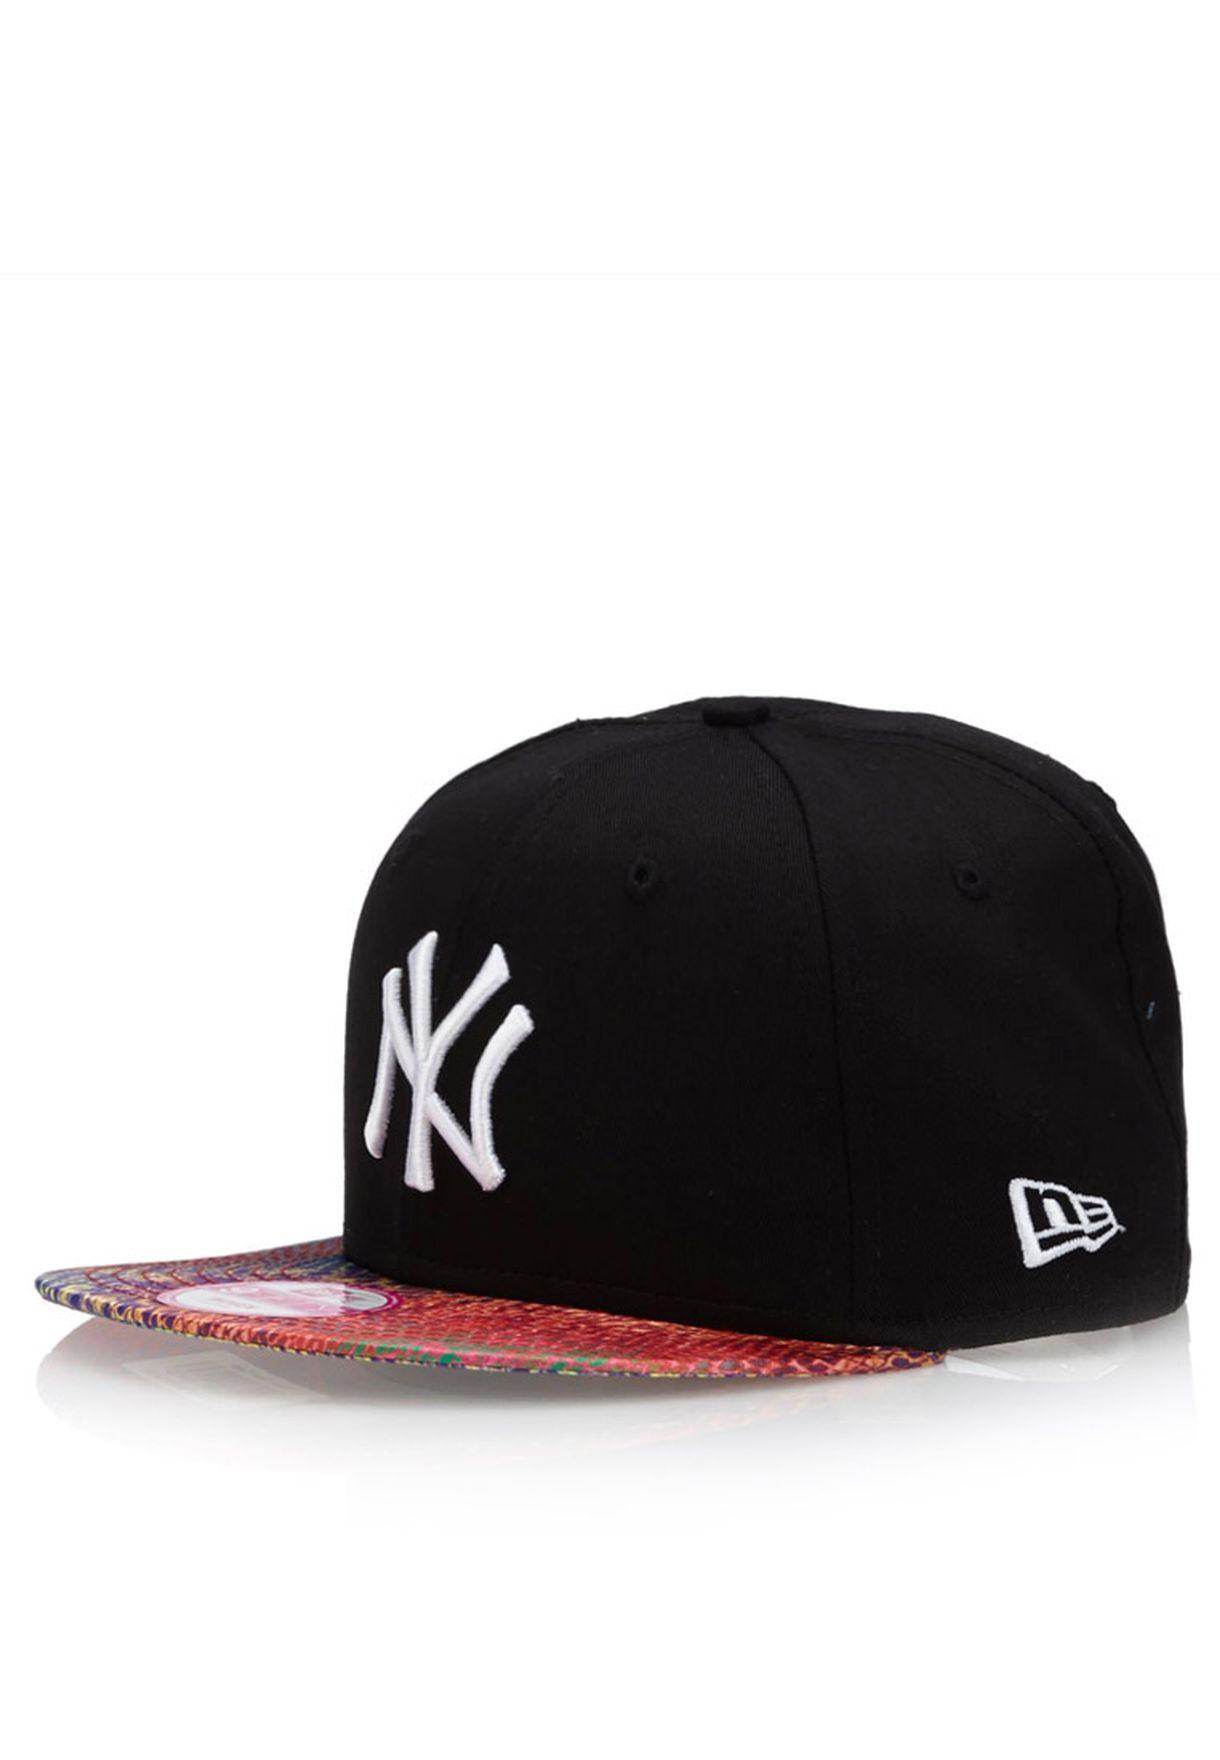 ee0c08c850f Shop New Era black 9Fifty New York Yankees Cap for Men in Oman -  NE207AC02SMN